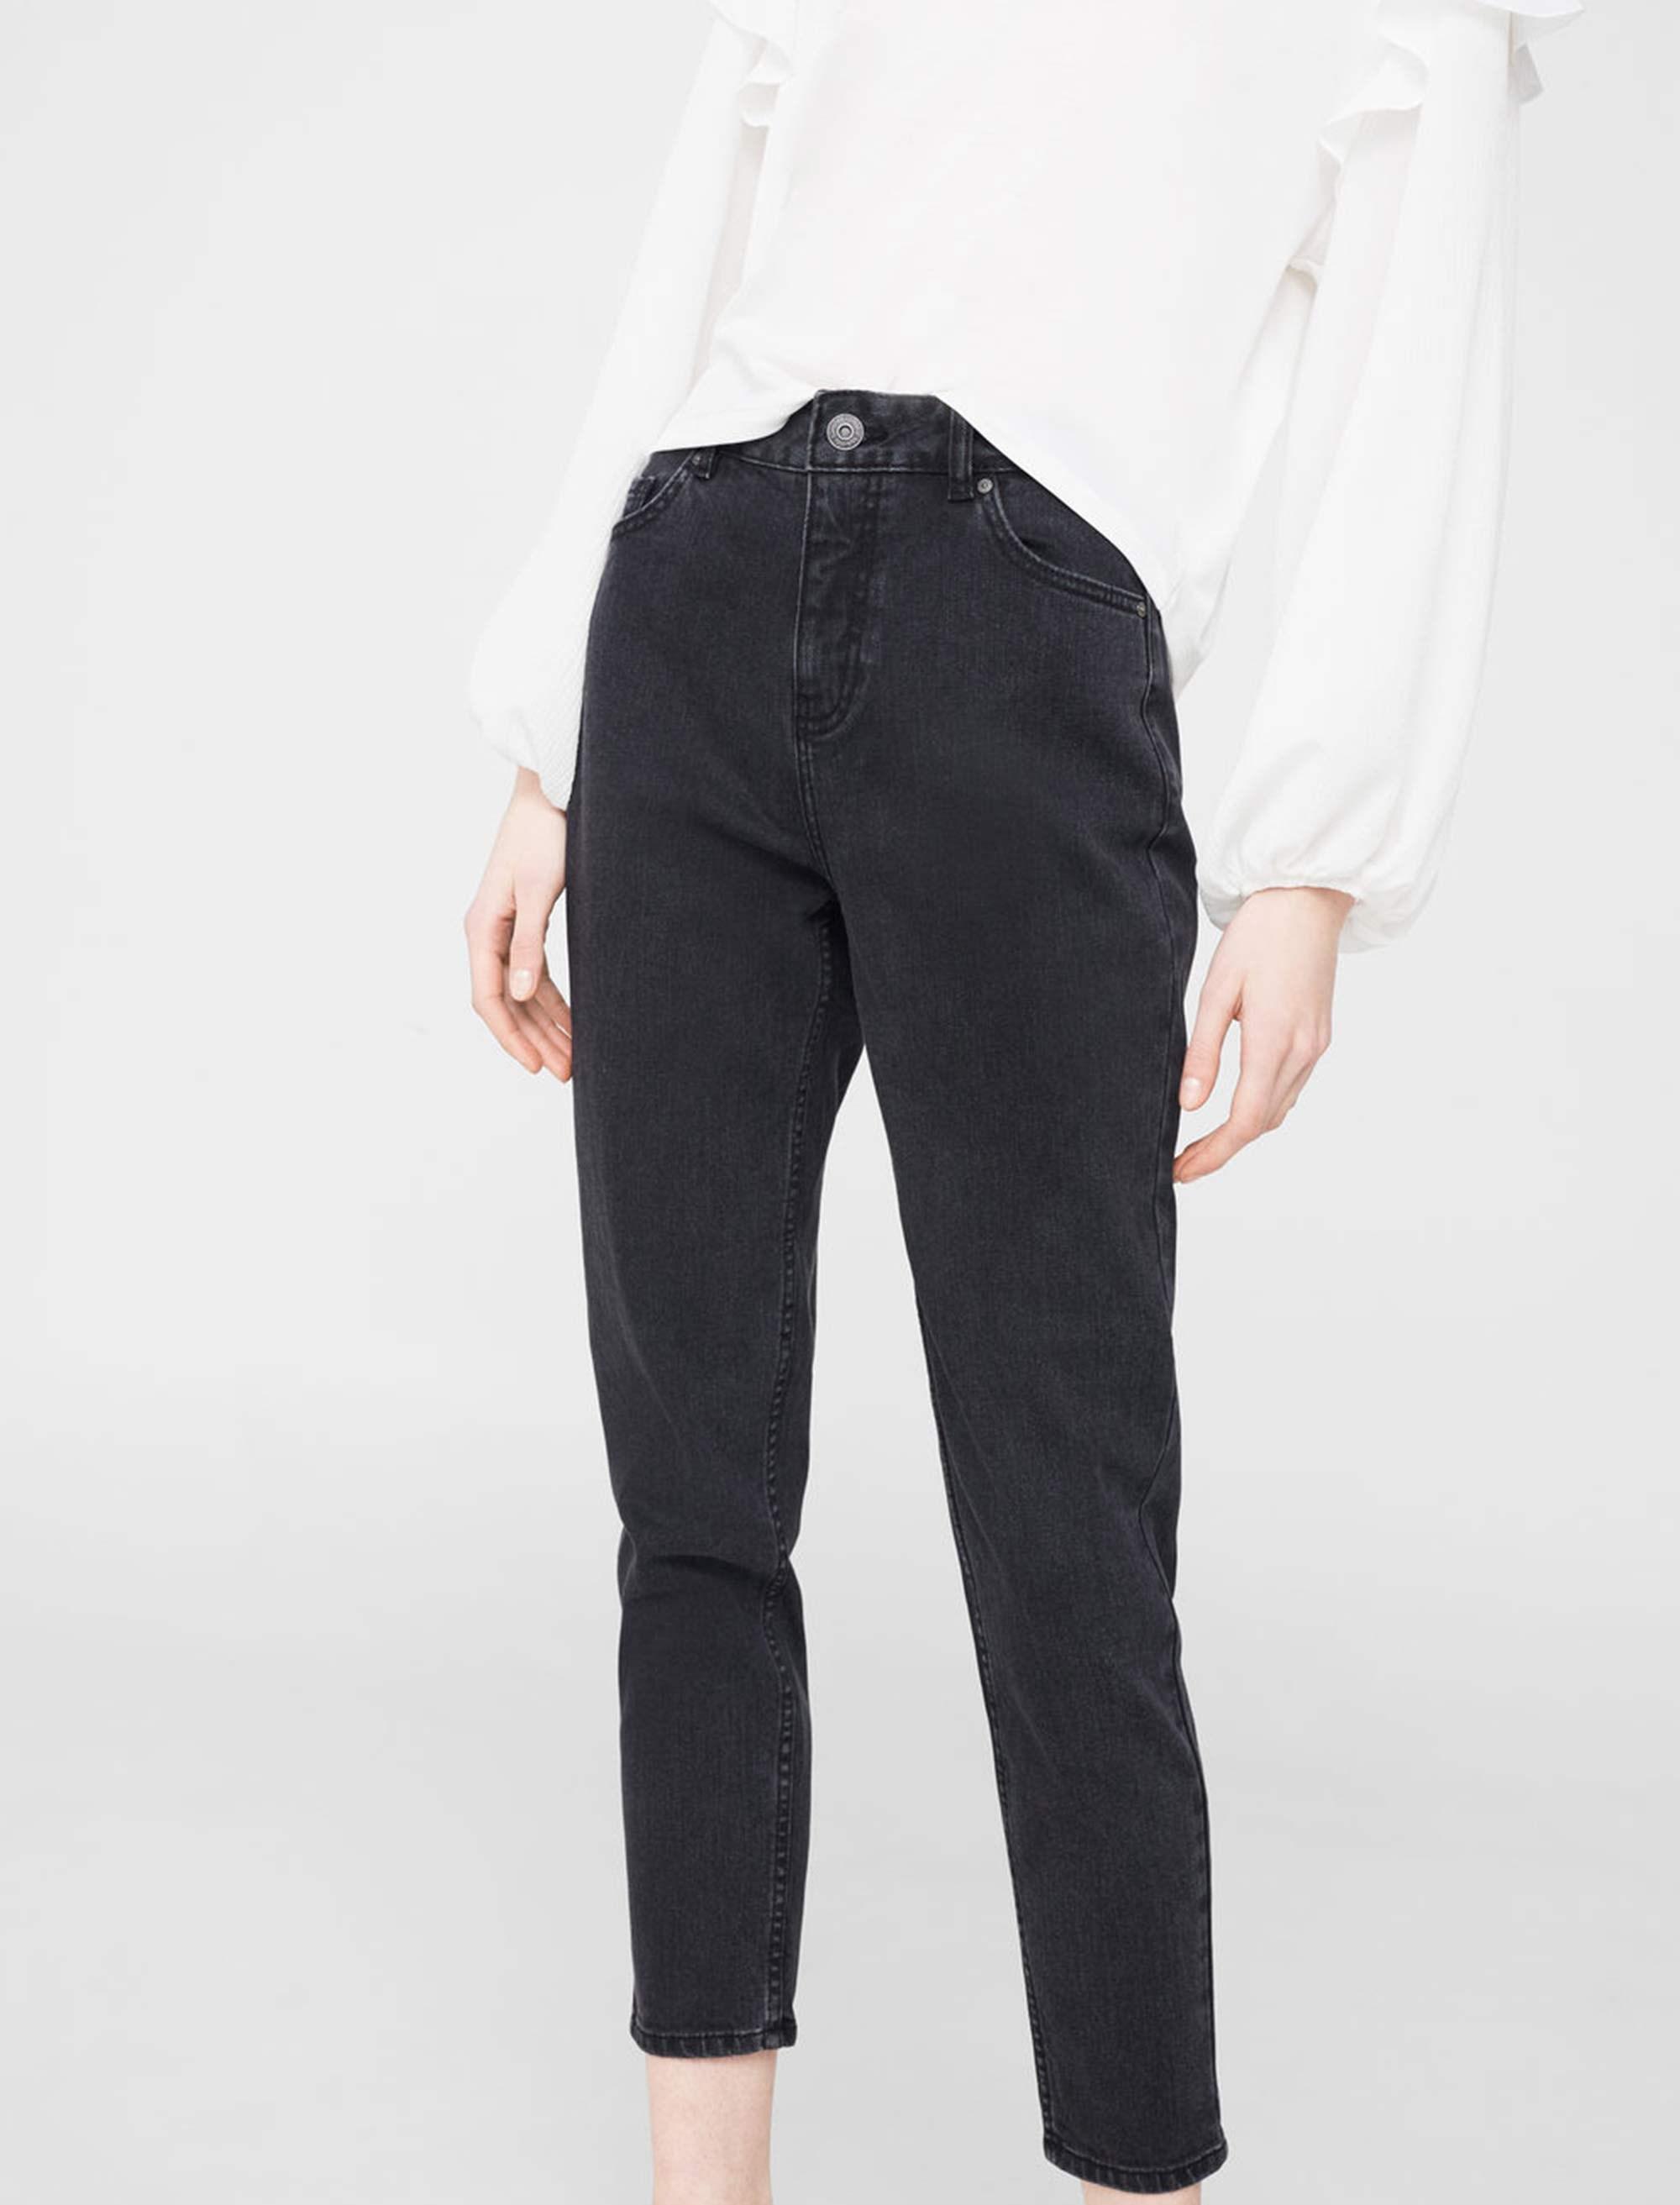 شلوار جین راسته زنانه - مانگو - زغالي - 2